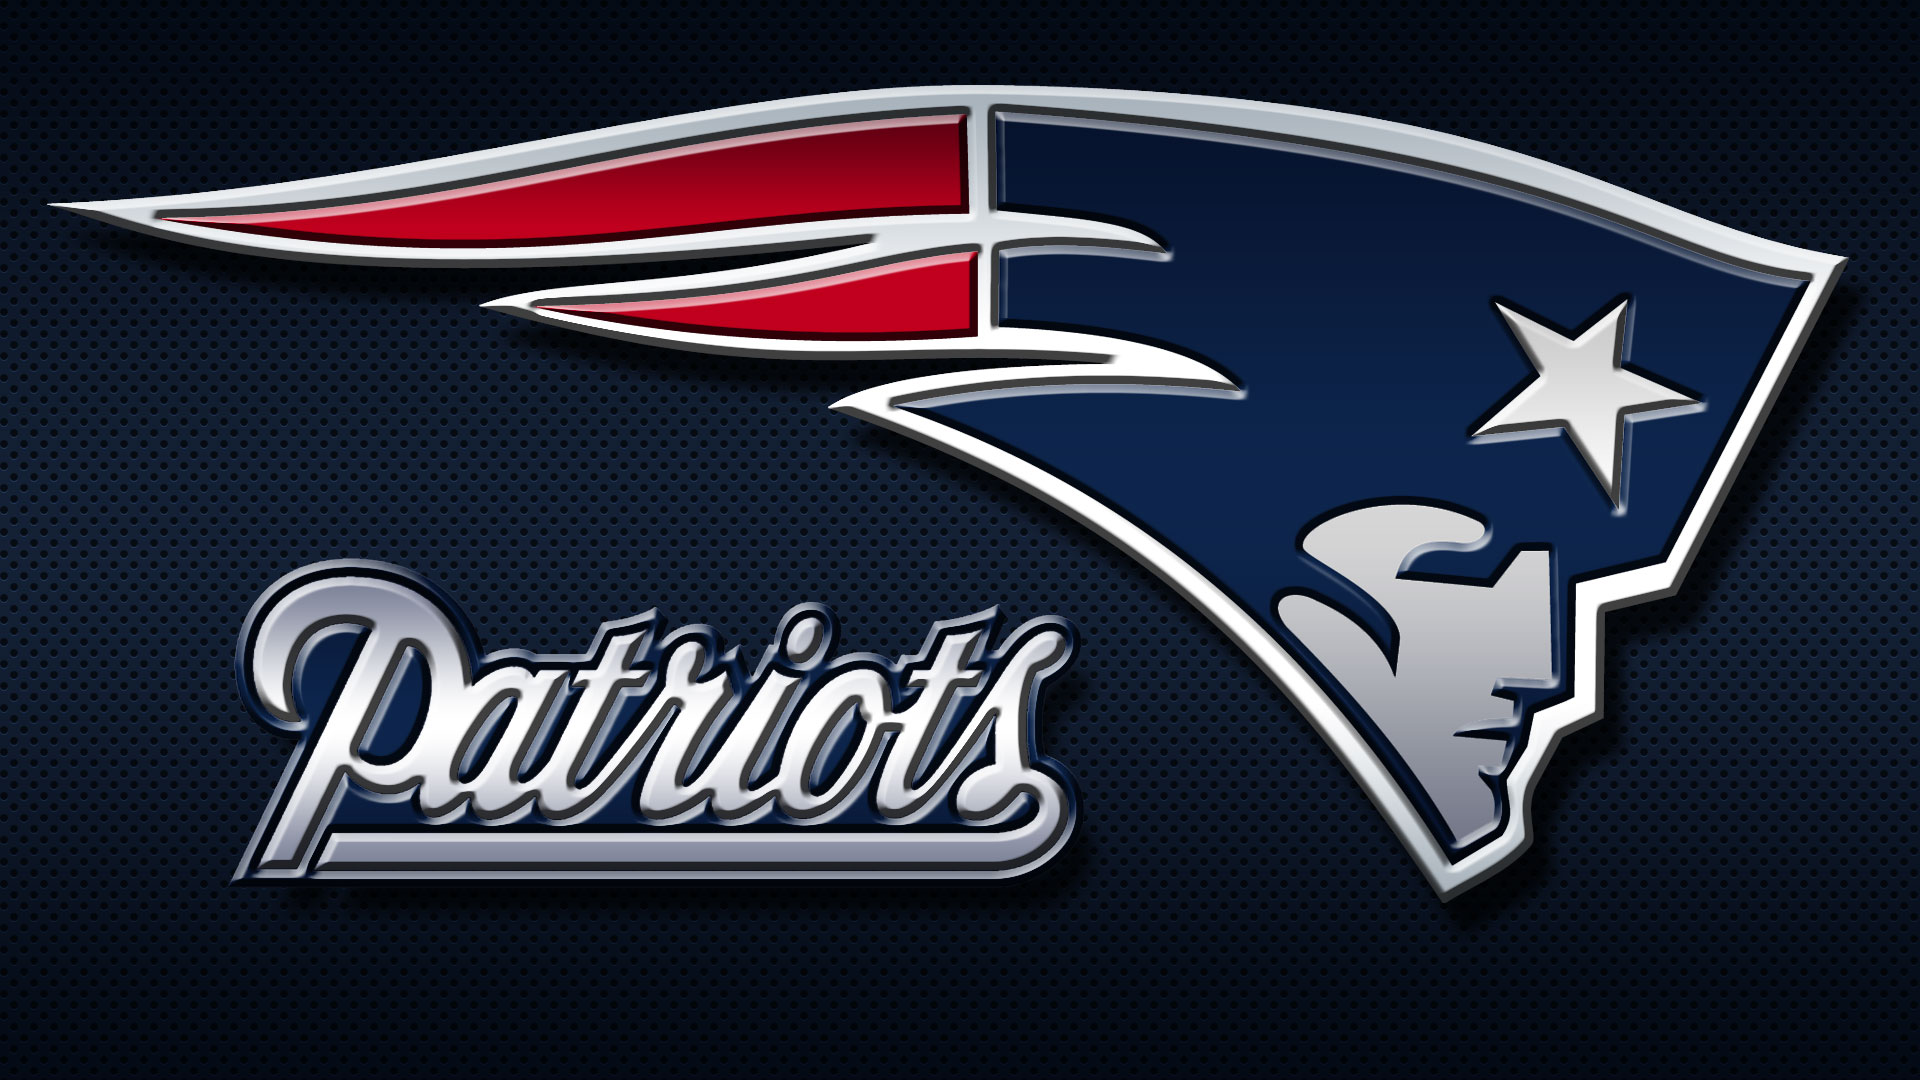 Patriots logo by Balsavor 1920x1080